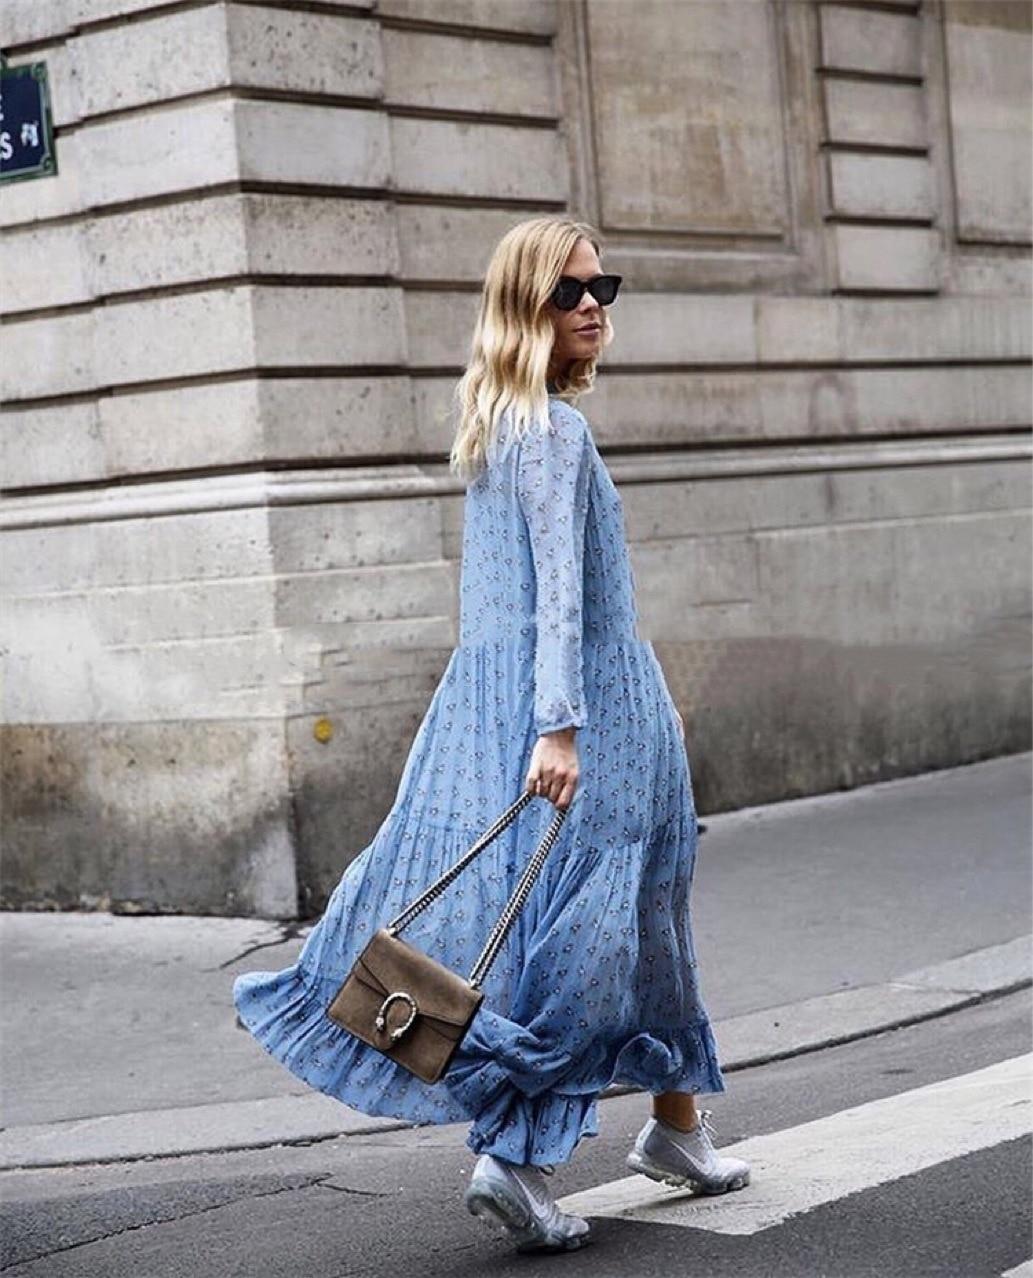 Women Dress Pony Printed Maxi Dress 2019 Elegant and Flowless Stand Collar Long Sleeve Long Dress